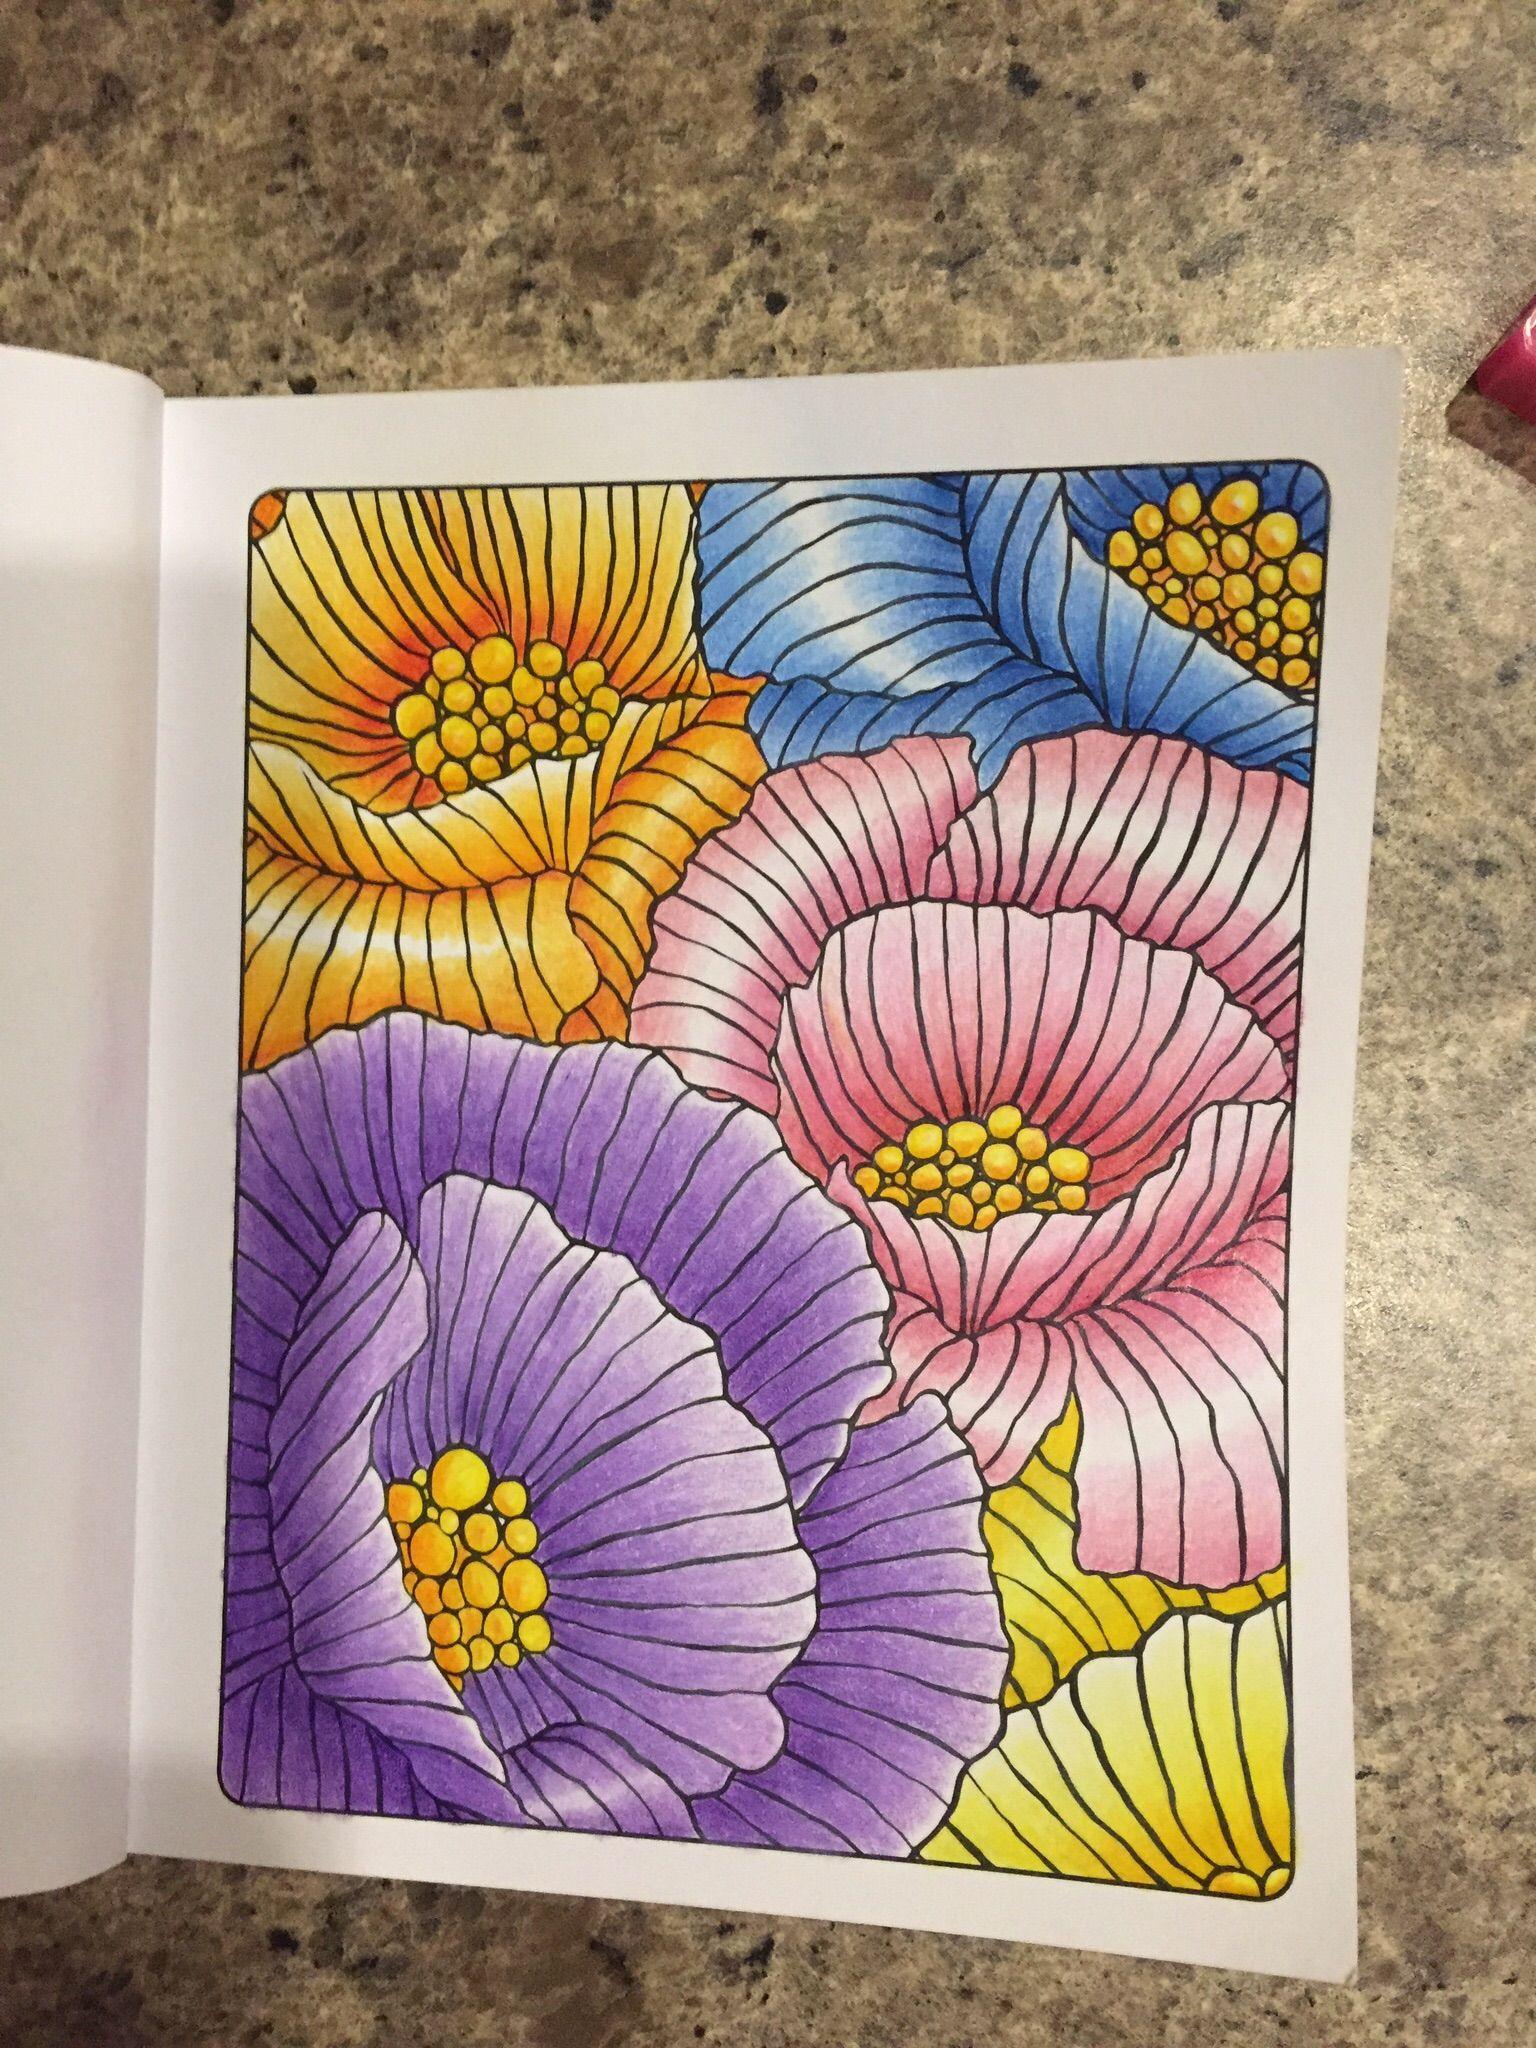 4a46027e91 Adult colouring the little book of calm colouring art ideas jpg 1536x2048 Little  book pencil